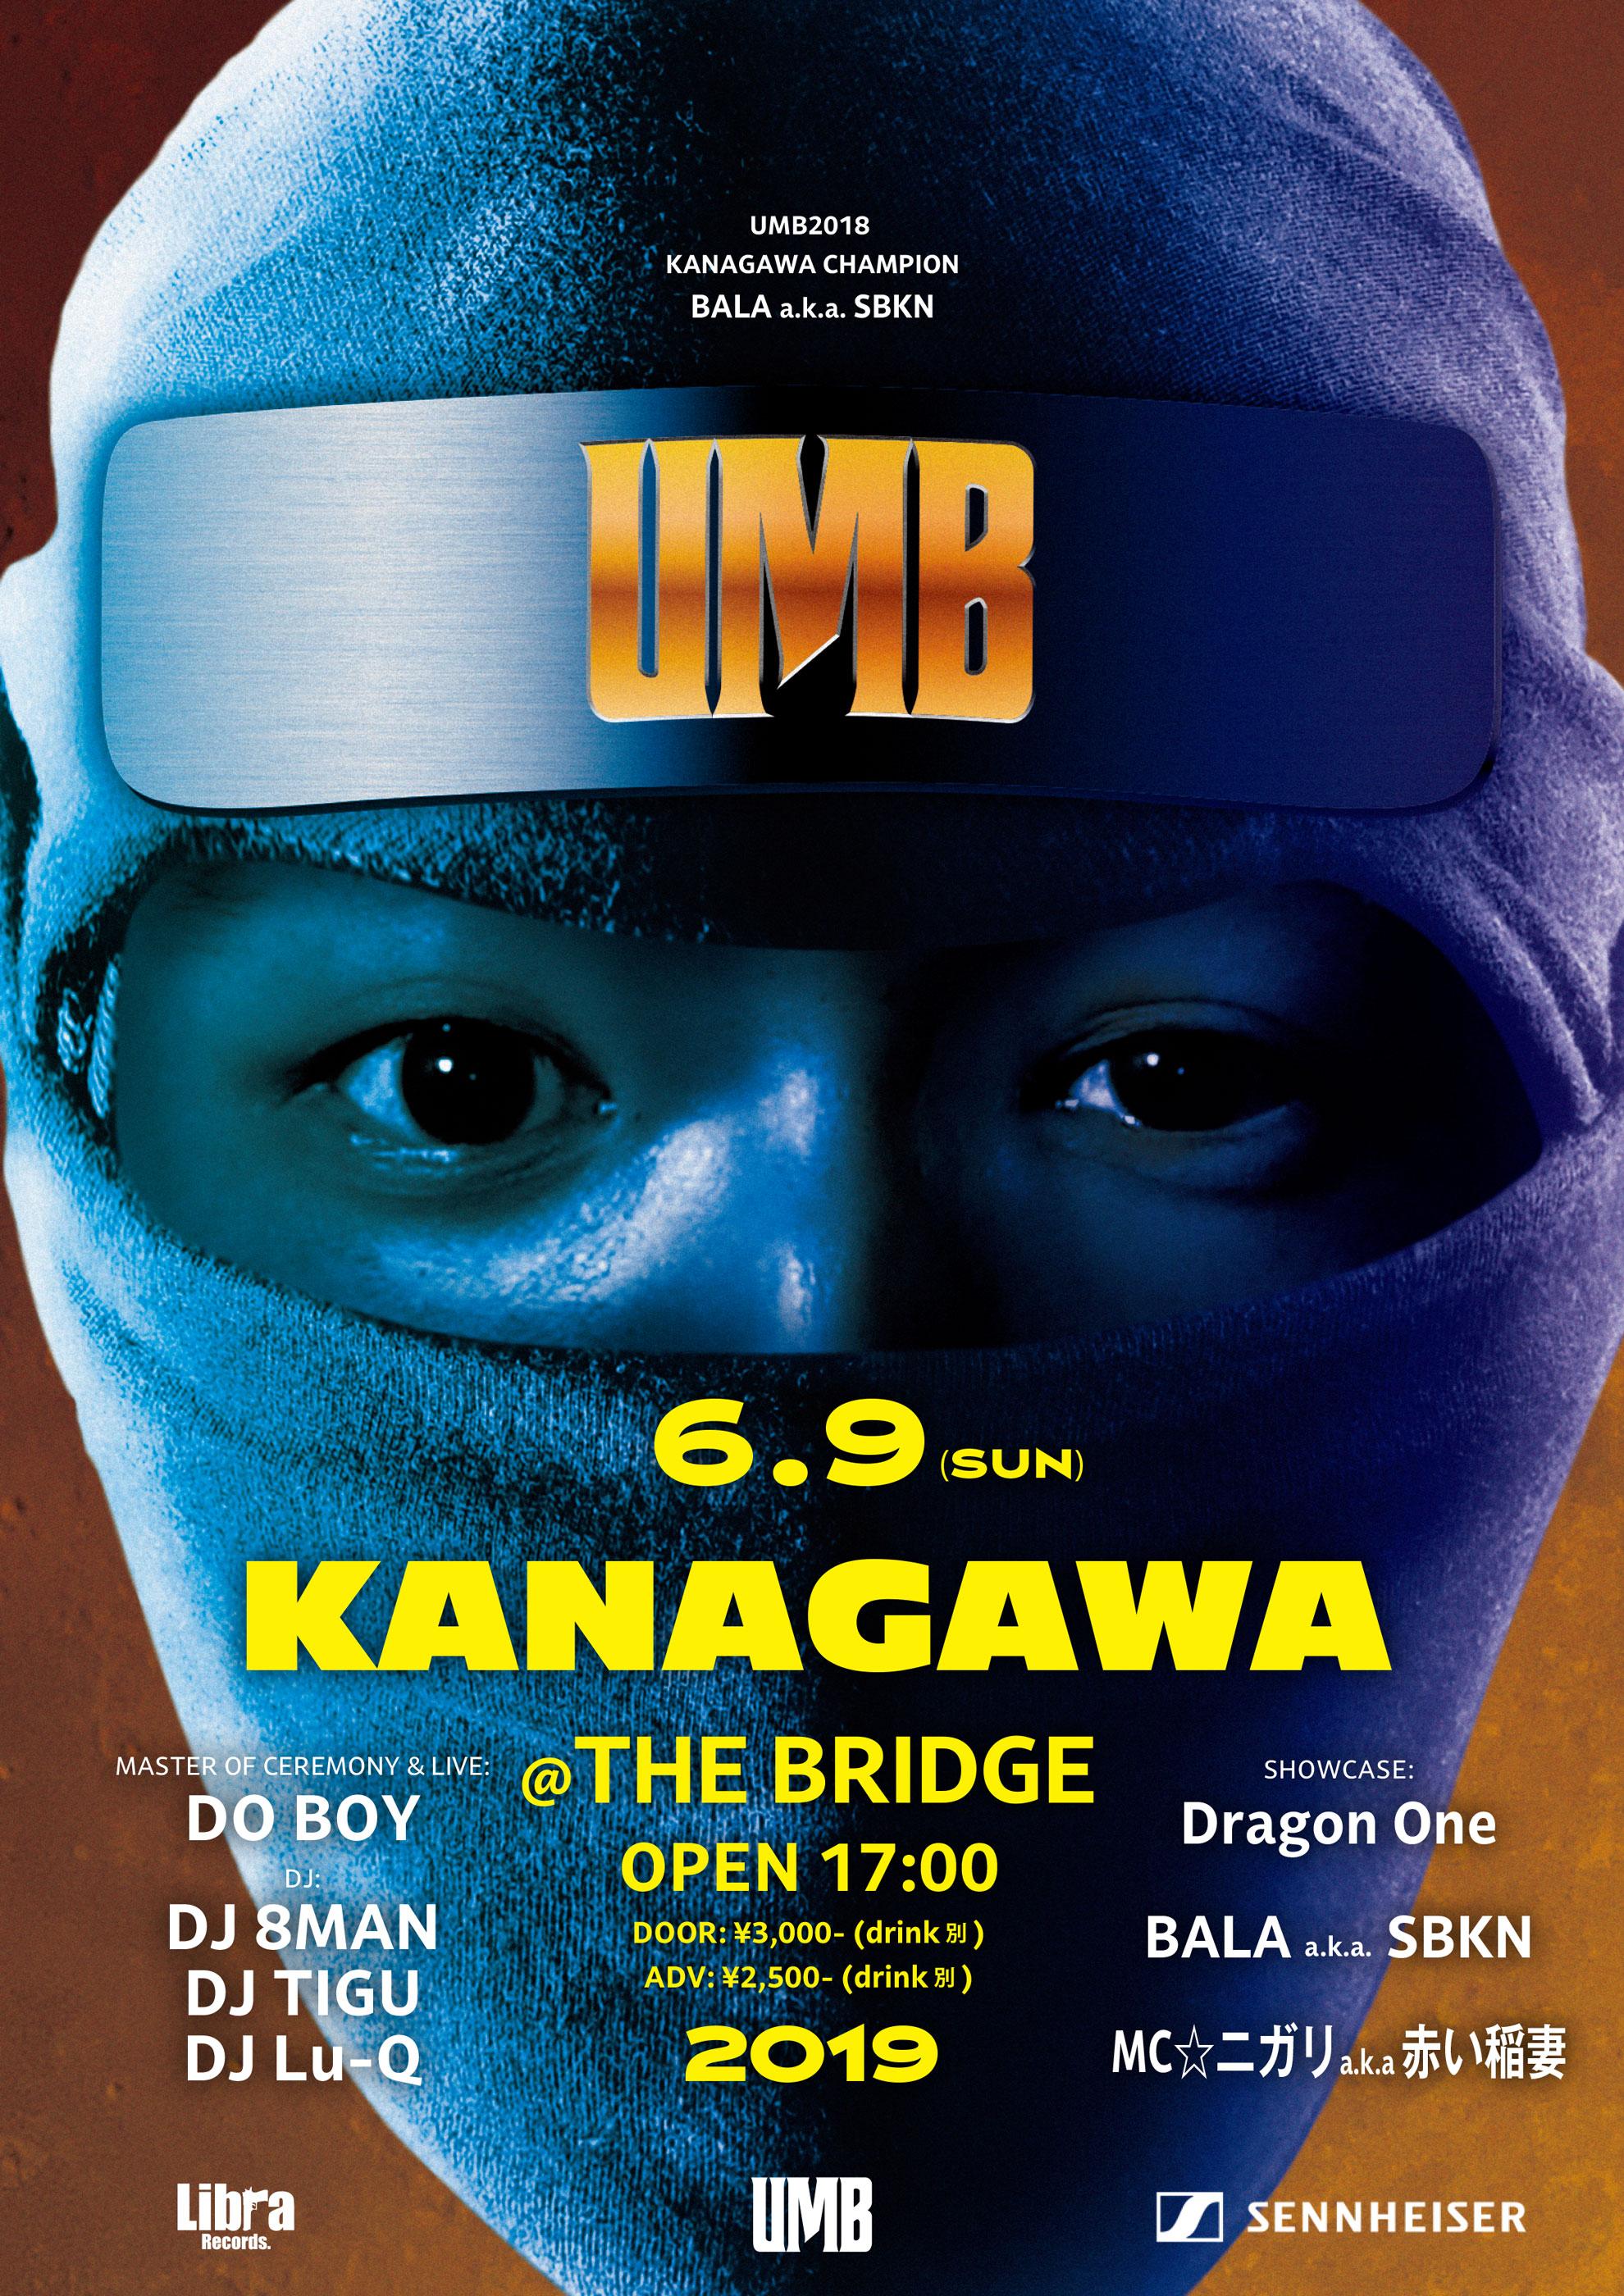 UMB2019_KANAGAWA-1